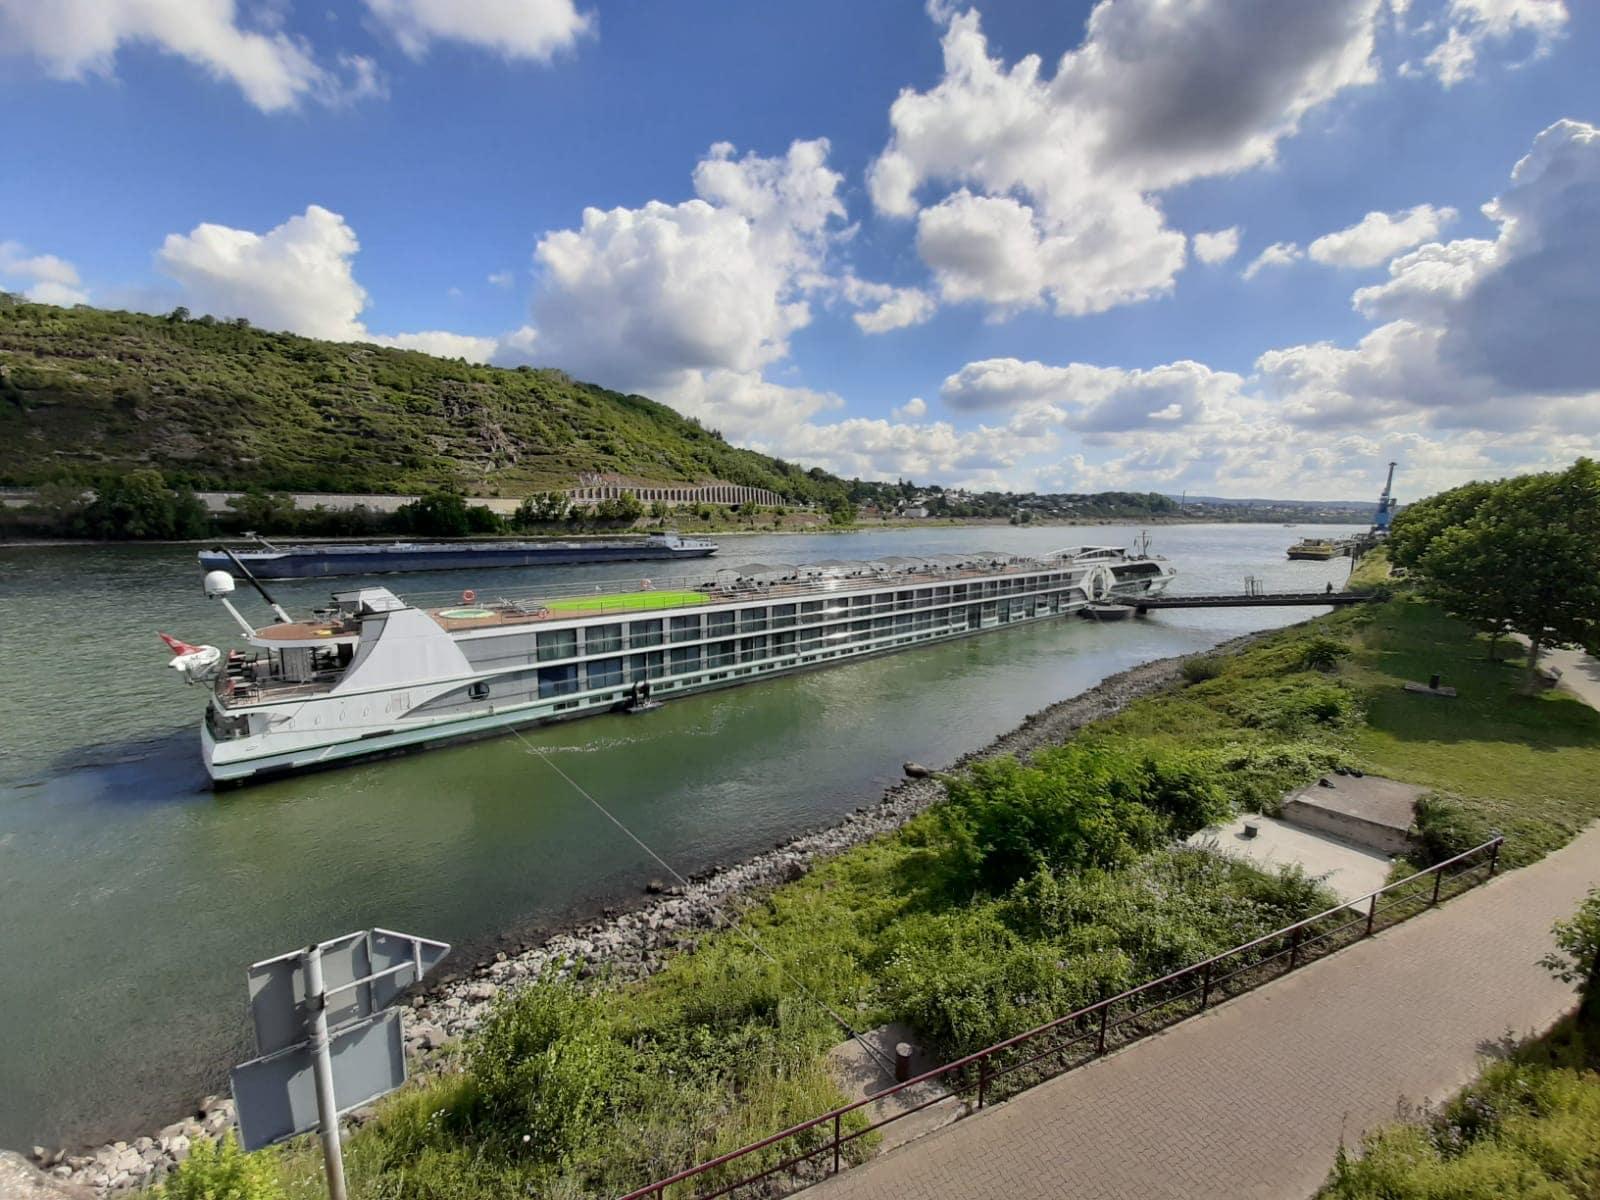 Rivierschip-VIVA Cruises-Viva Inspire-Cruise-Schip